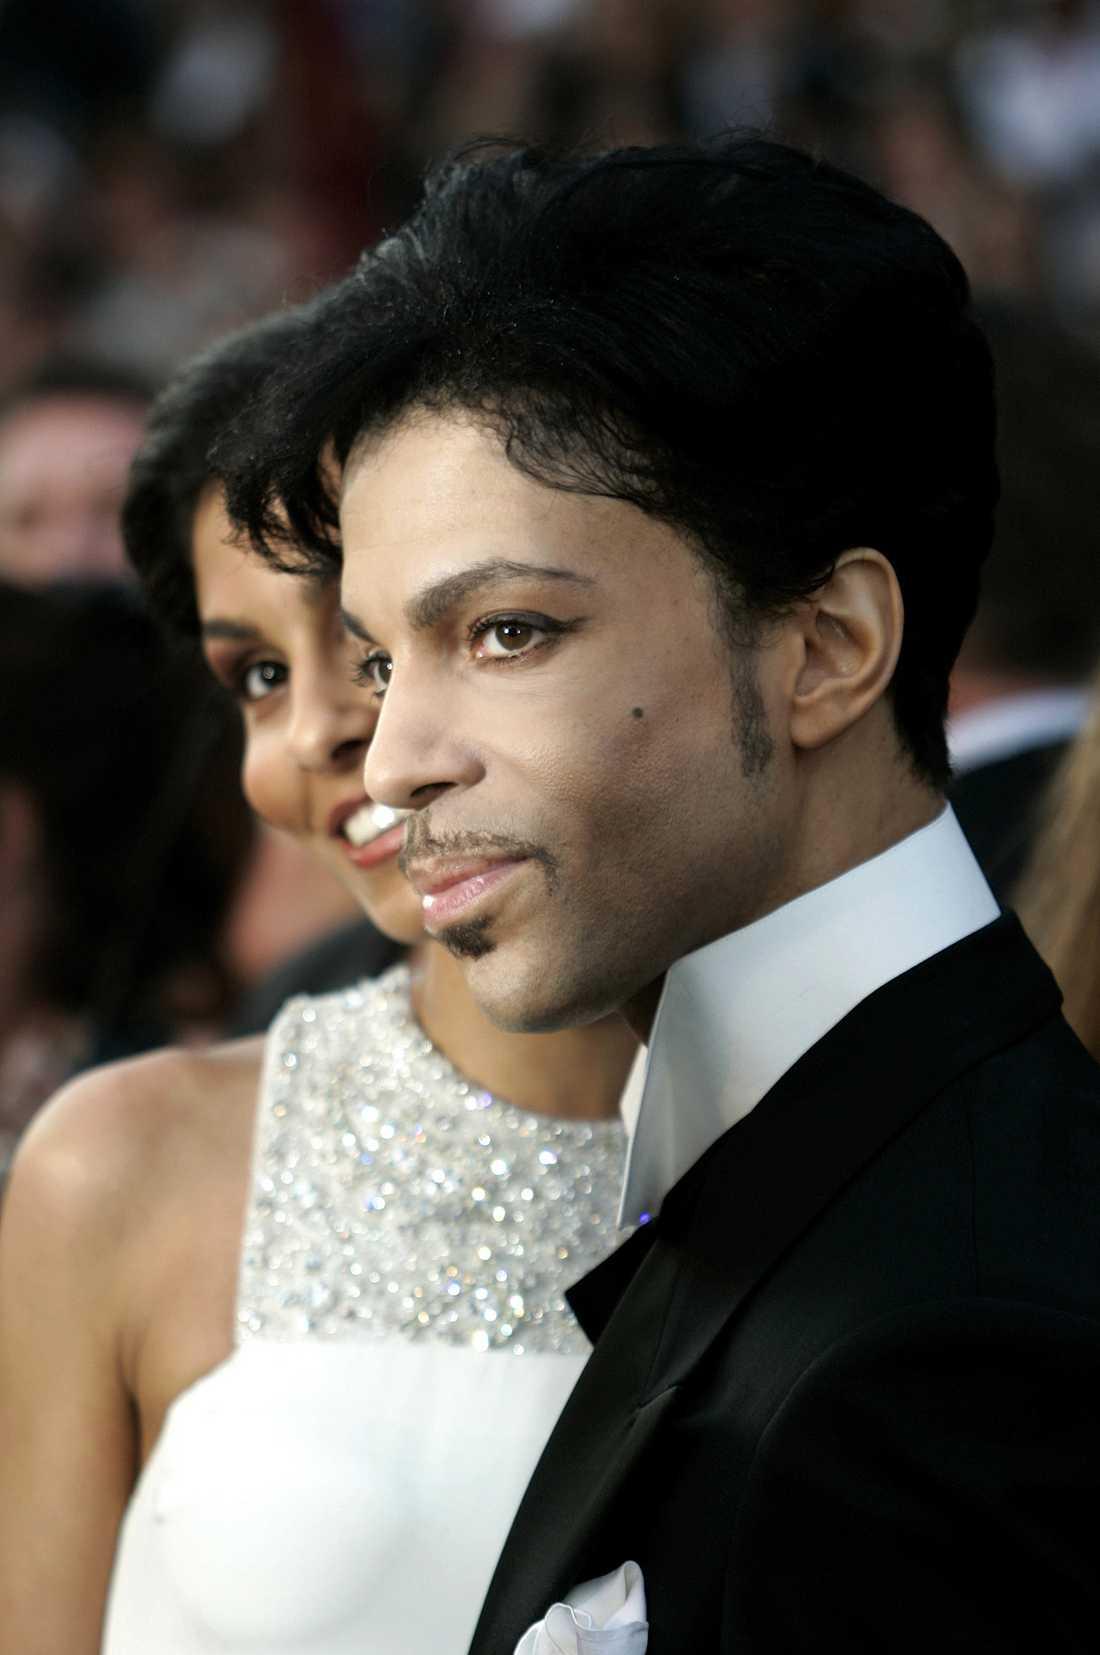 Prince med fru Manuela Testolini på Oscarsgalan 2005